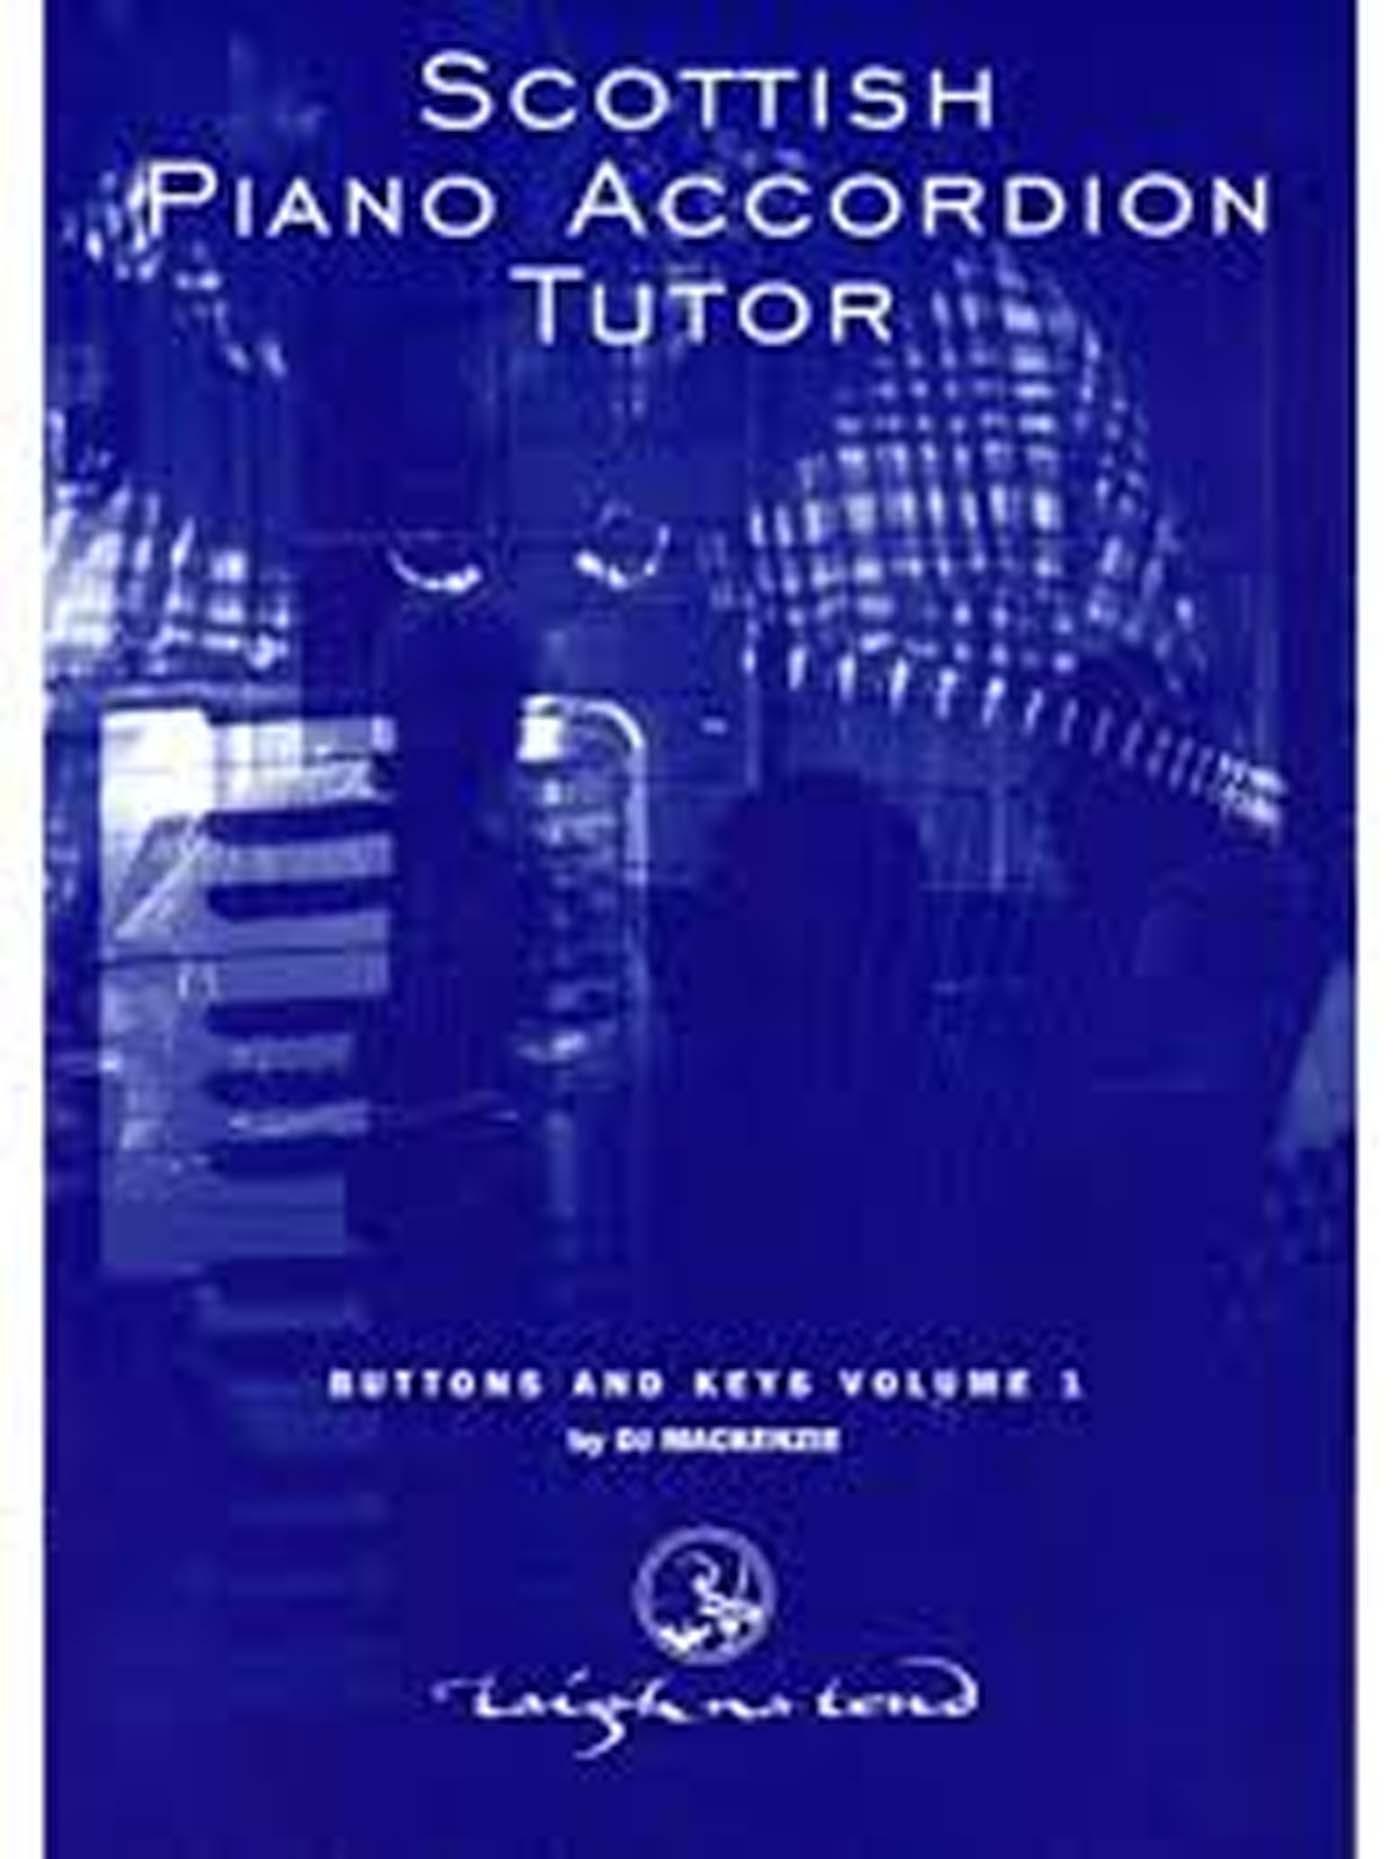 Scottish Piano Accordion Tutor Book Buttons And Keys Vol 1 Mackenzie S147